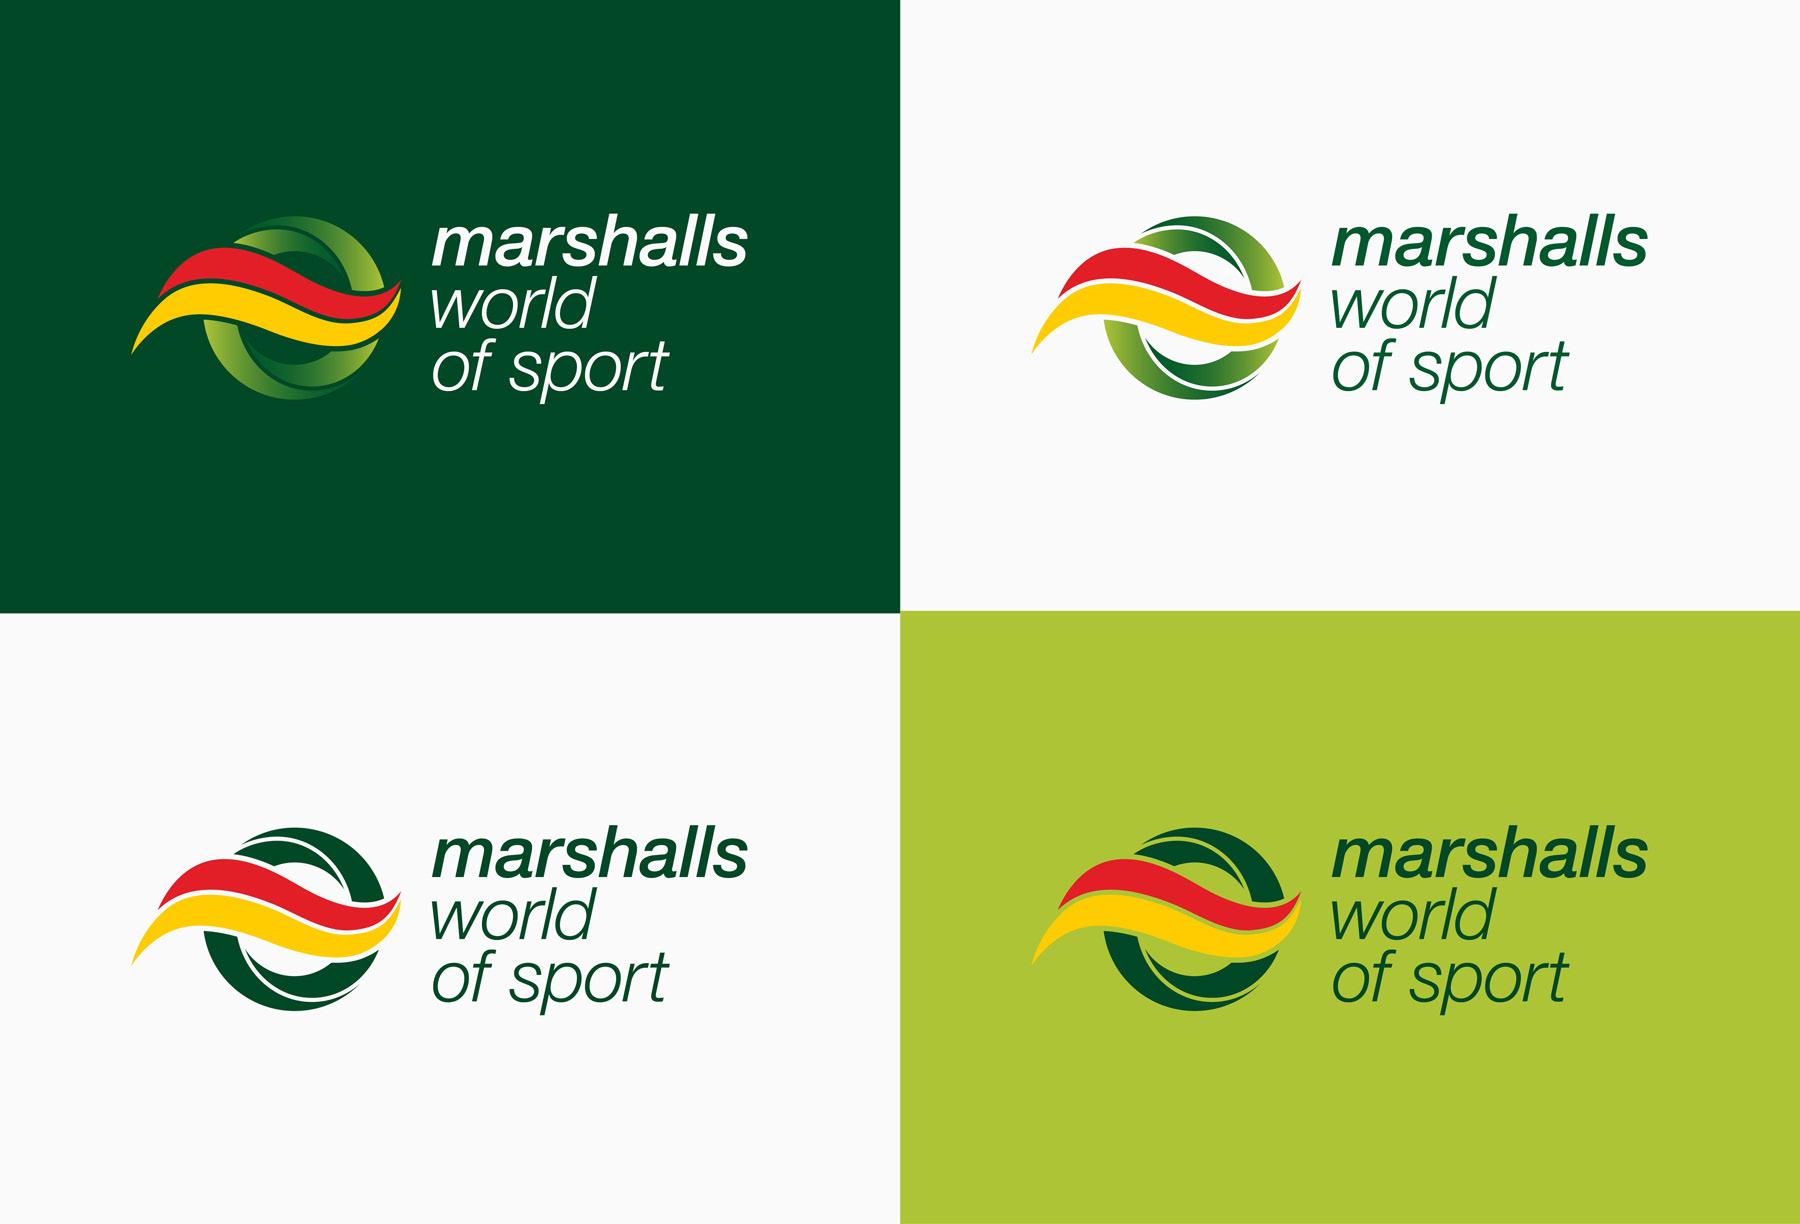 Marshalls world of sport betting sbo222 betting odds